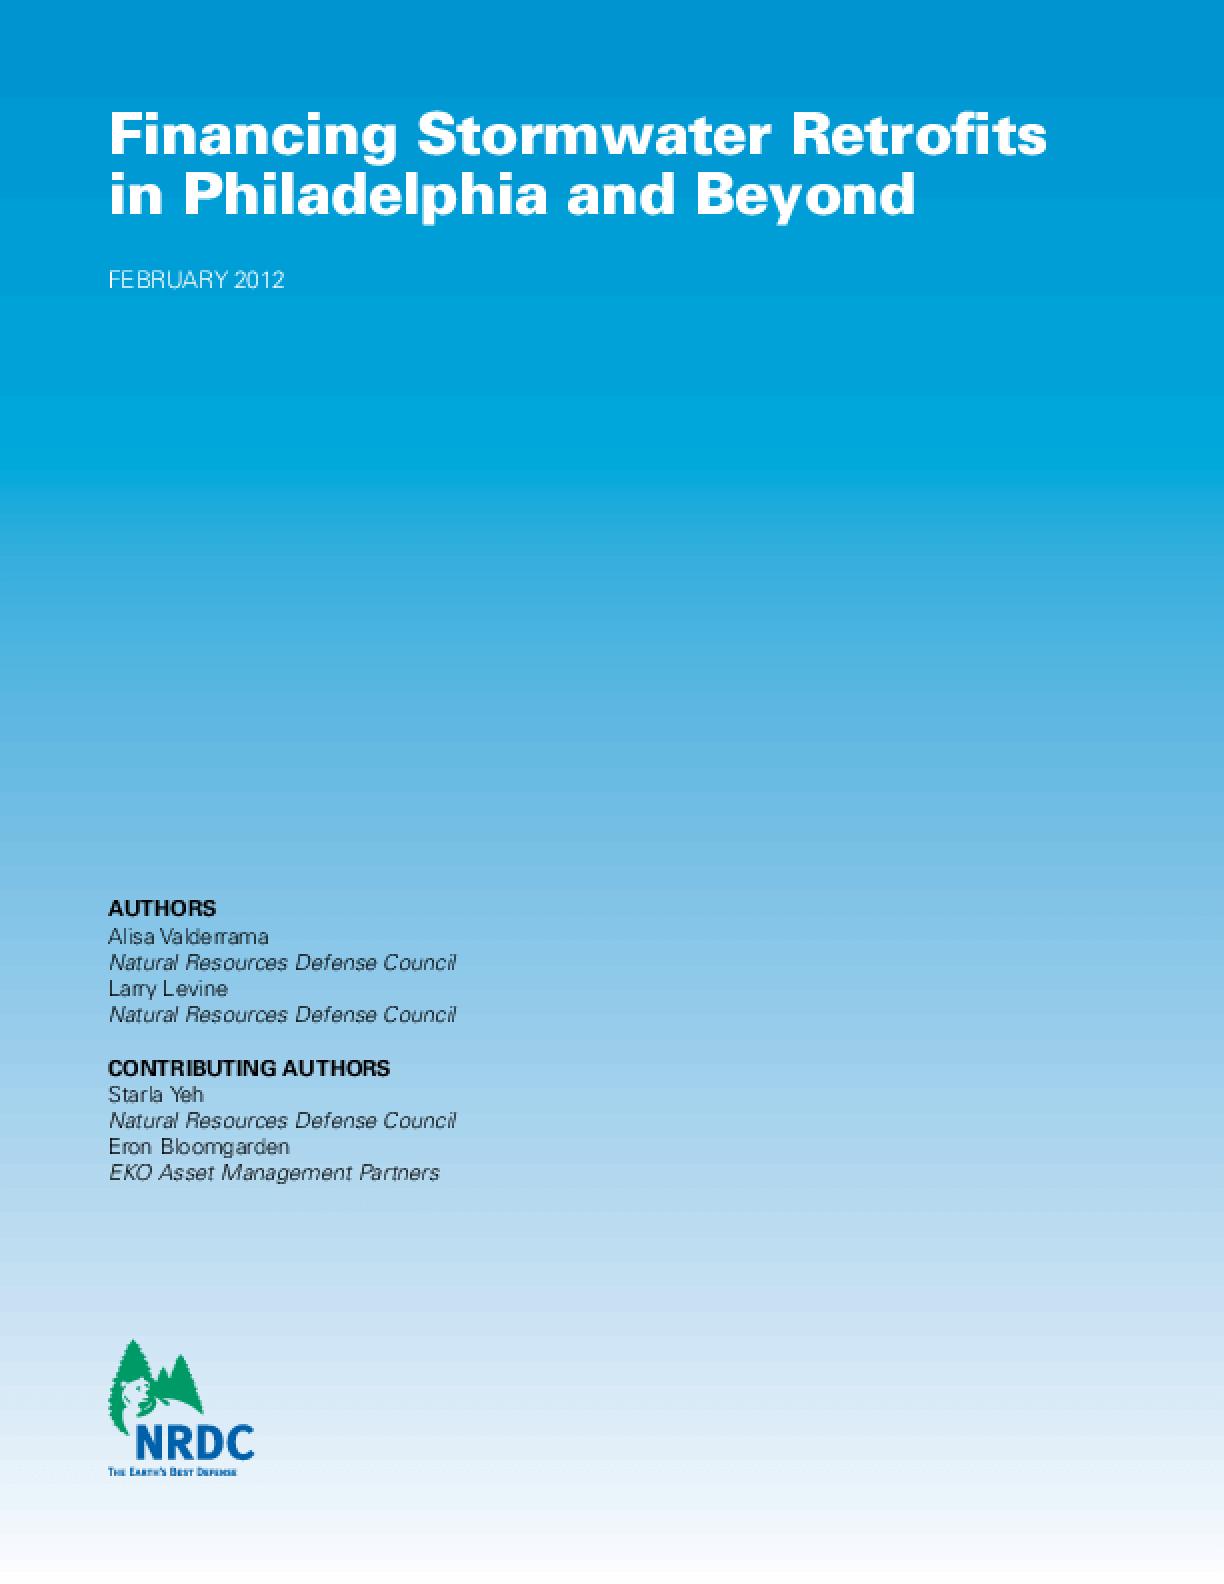 Financing Stormwater Retrofits in Philadelphia and Beyond